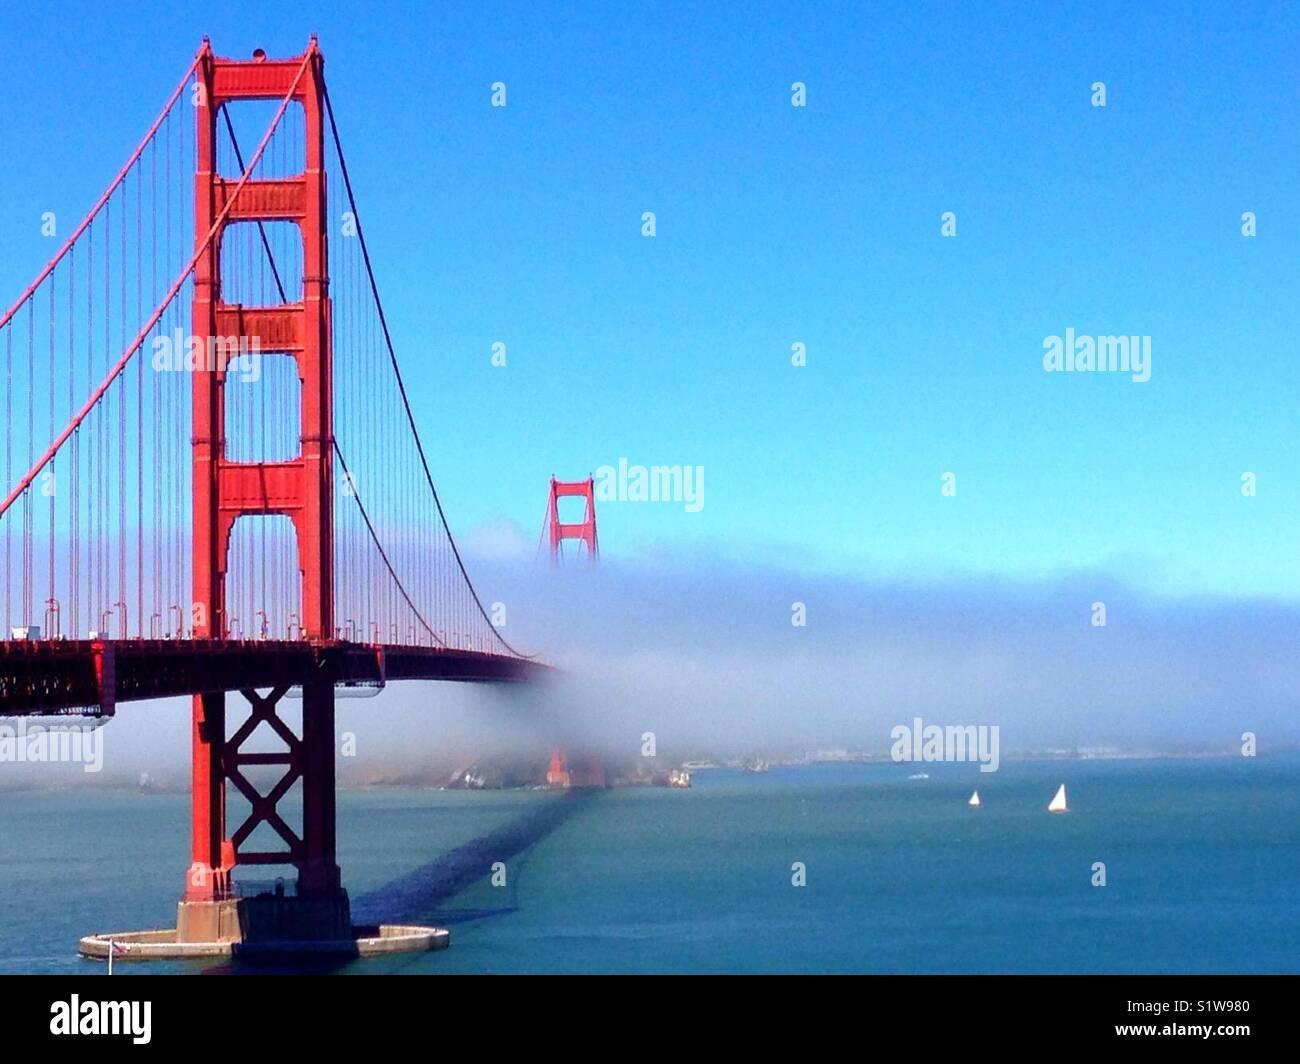 Nebel Riemen über die Golden Gate Bridge. Stockbild